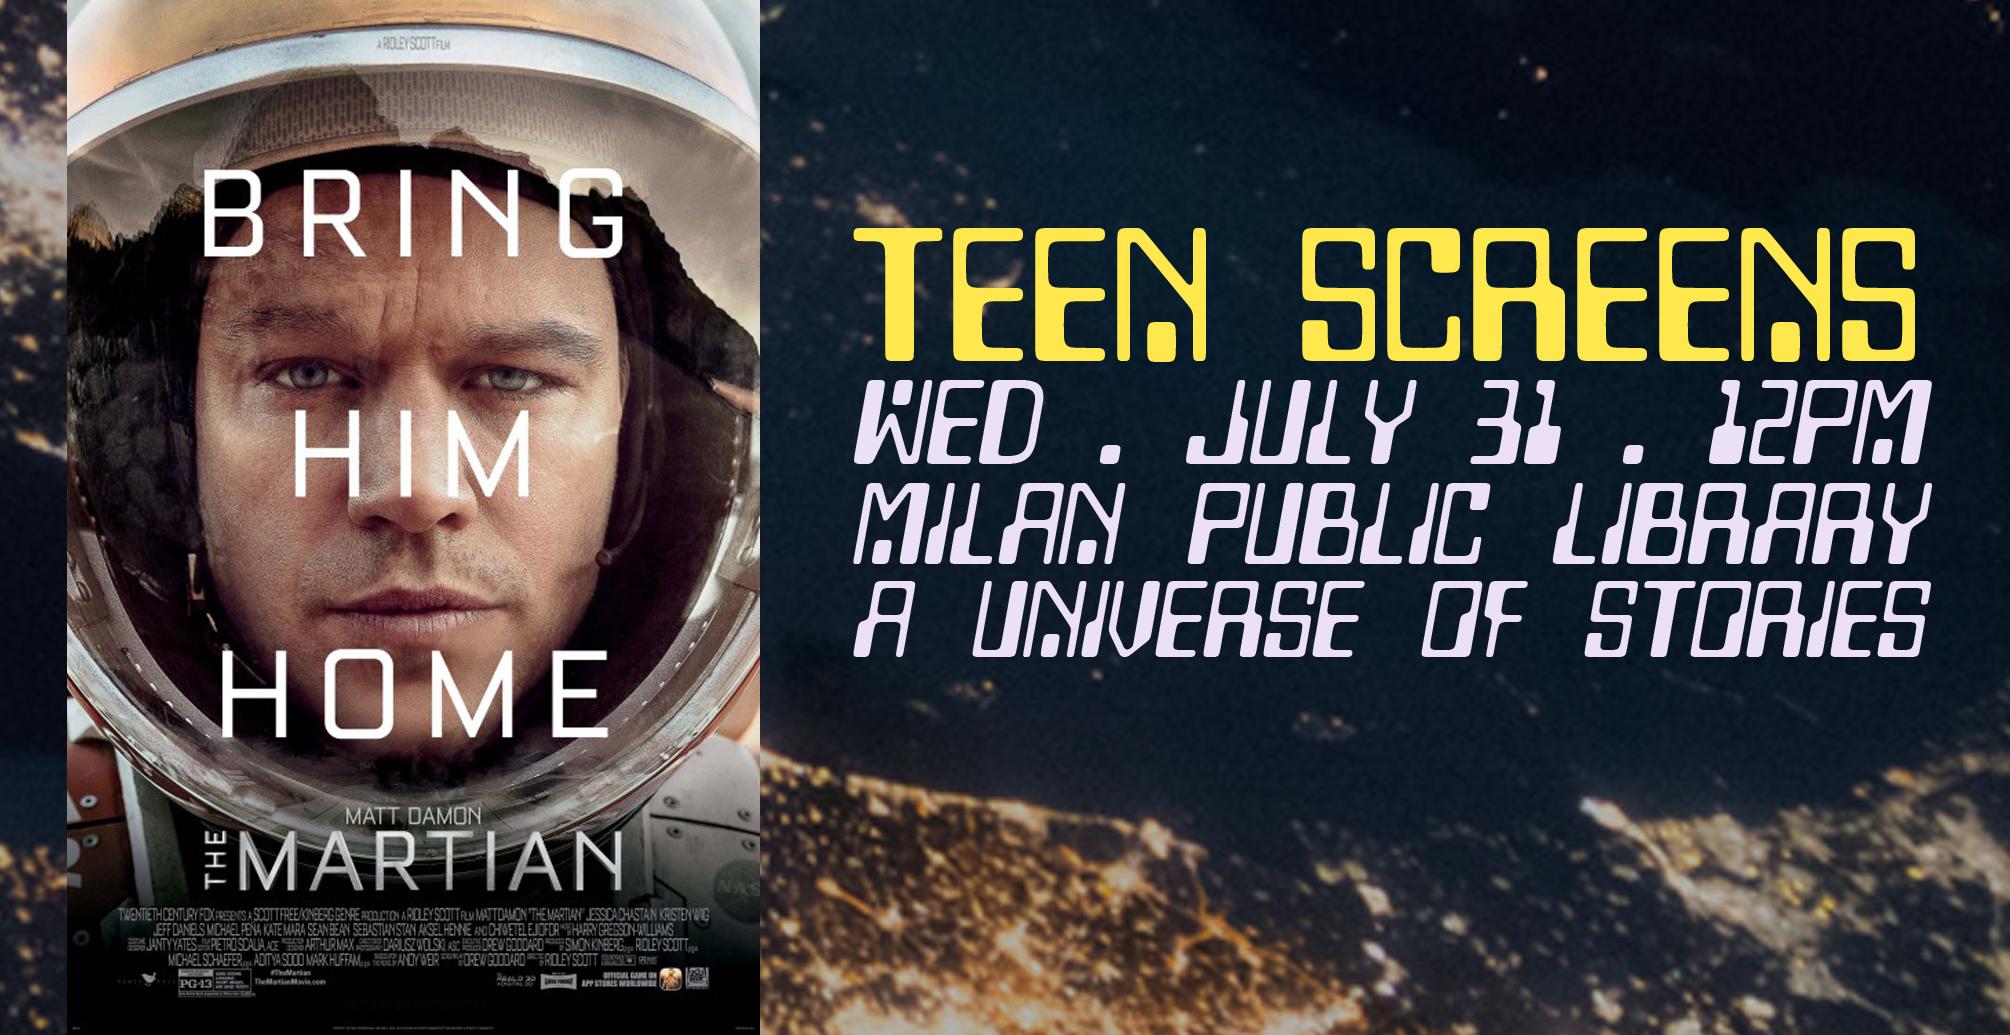 2019-07-TEEN-Milan-Martian-Slide